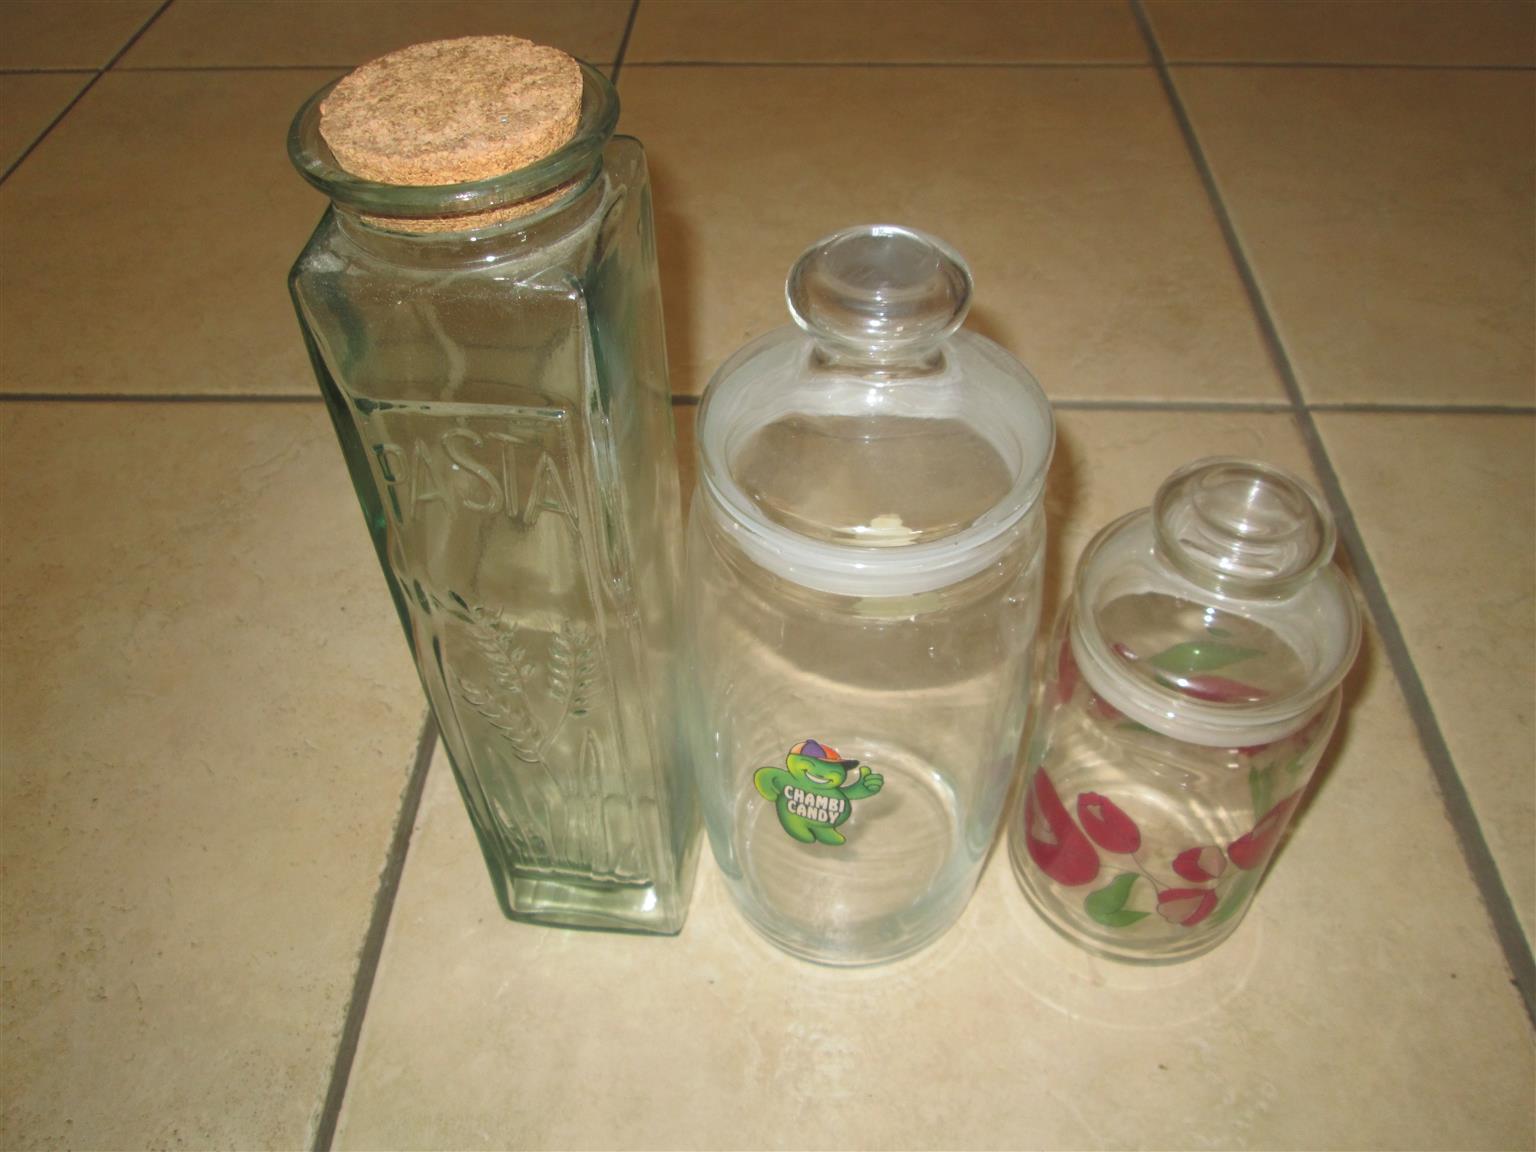 Spaghetti Storage Glass,Biscuit Jar and Sweet Jar